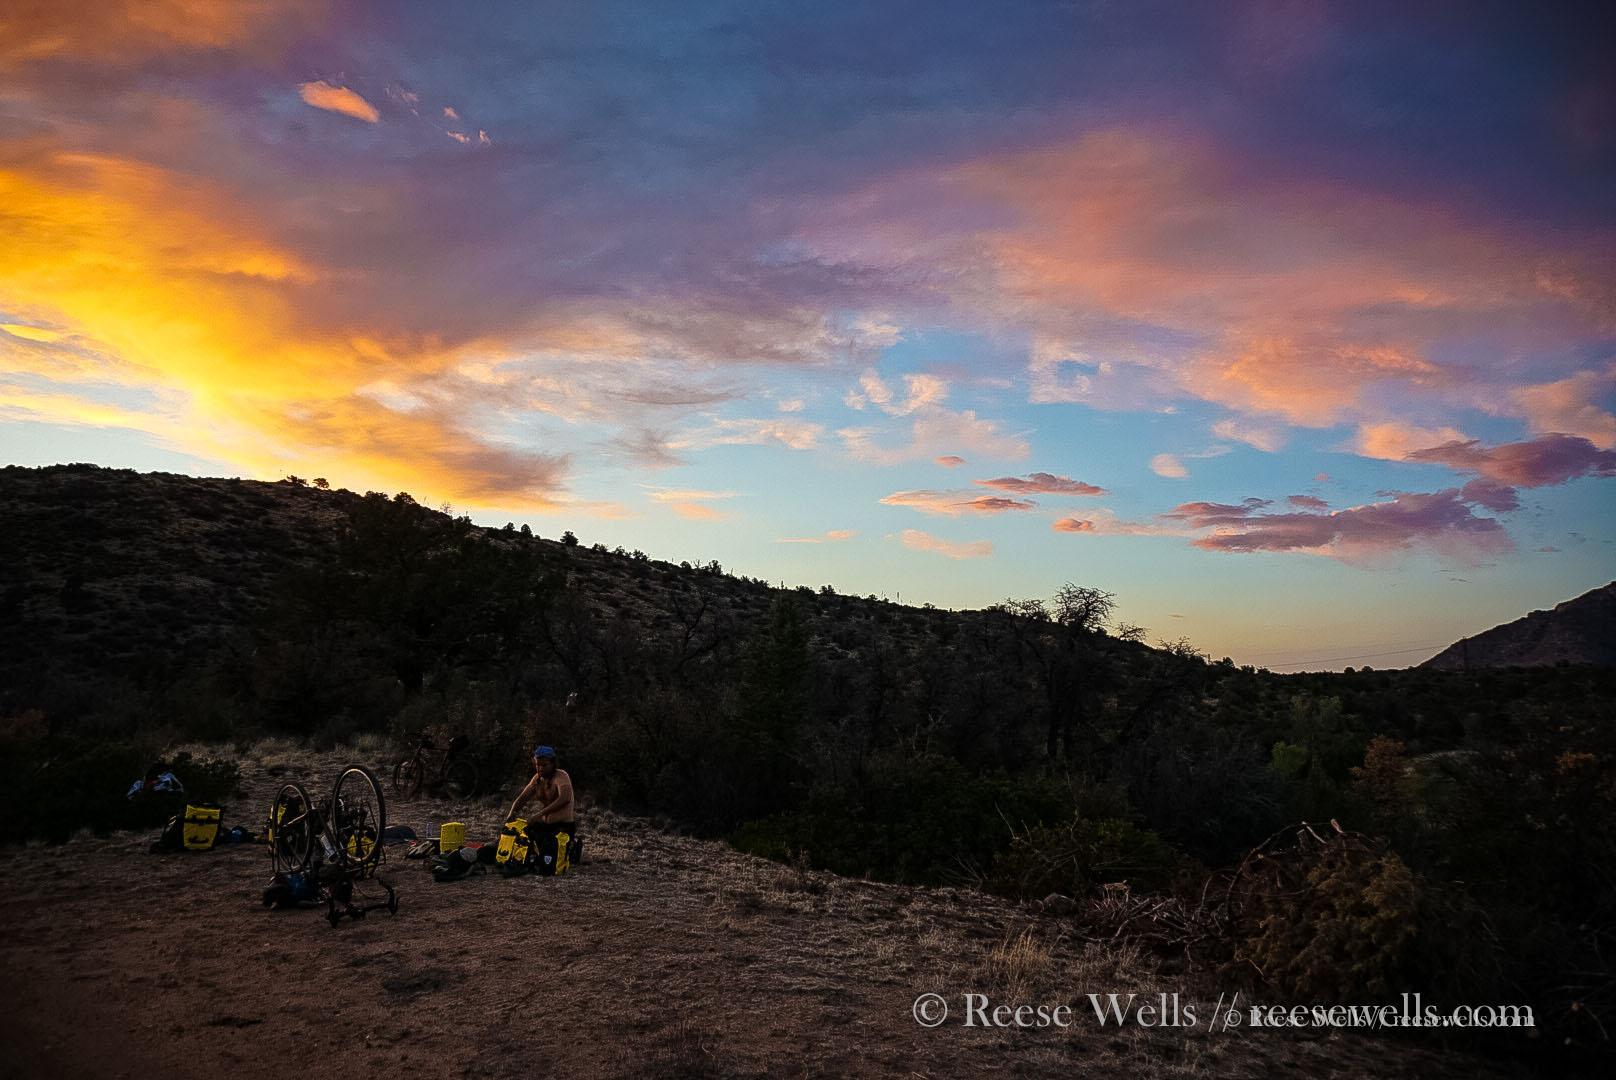 Camping outside of Prescott, Arizona. A wild sunset. No tent necessary here.